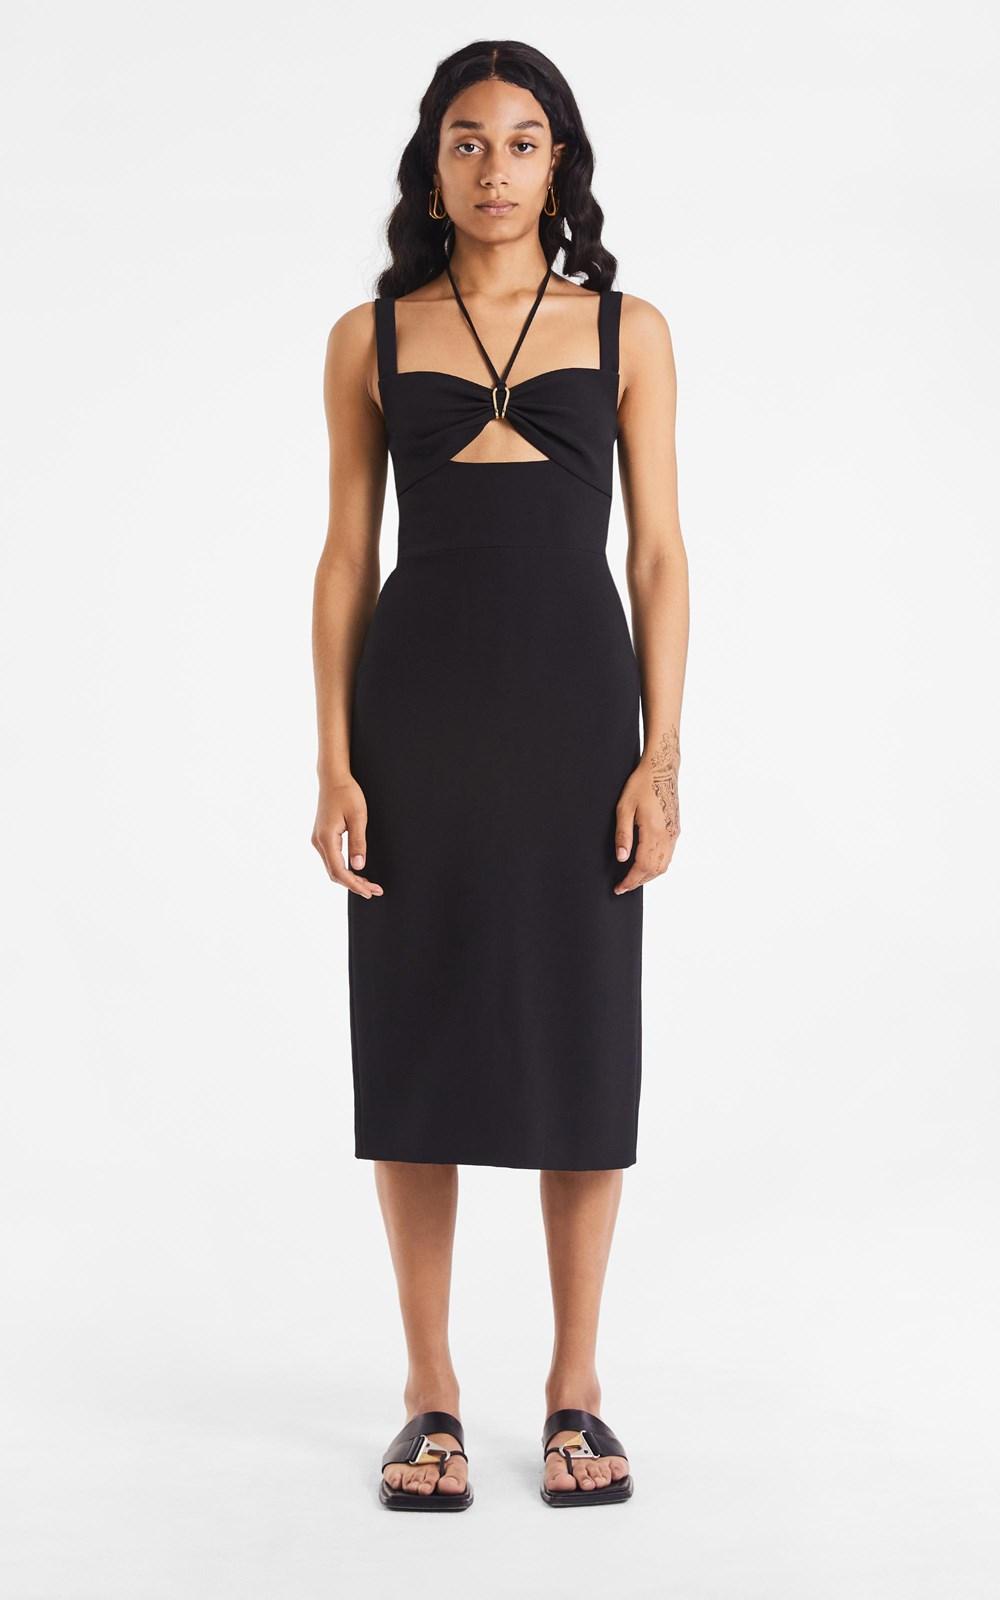 Dresses | SINGLE LINK CADY DRESS